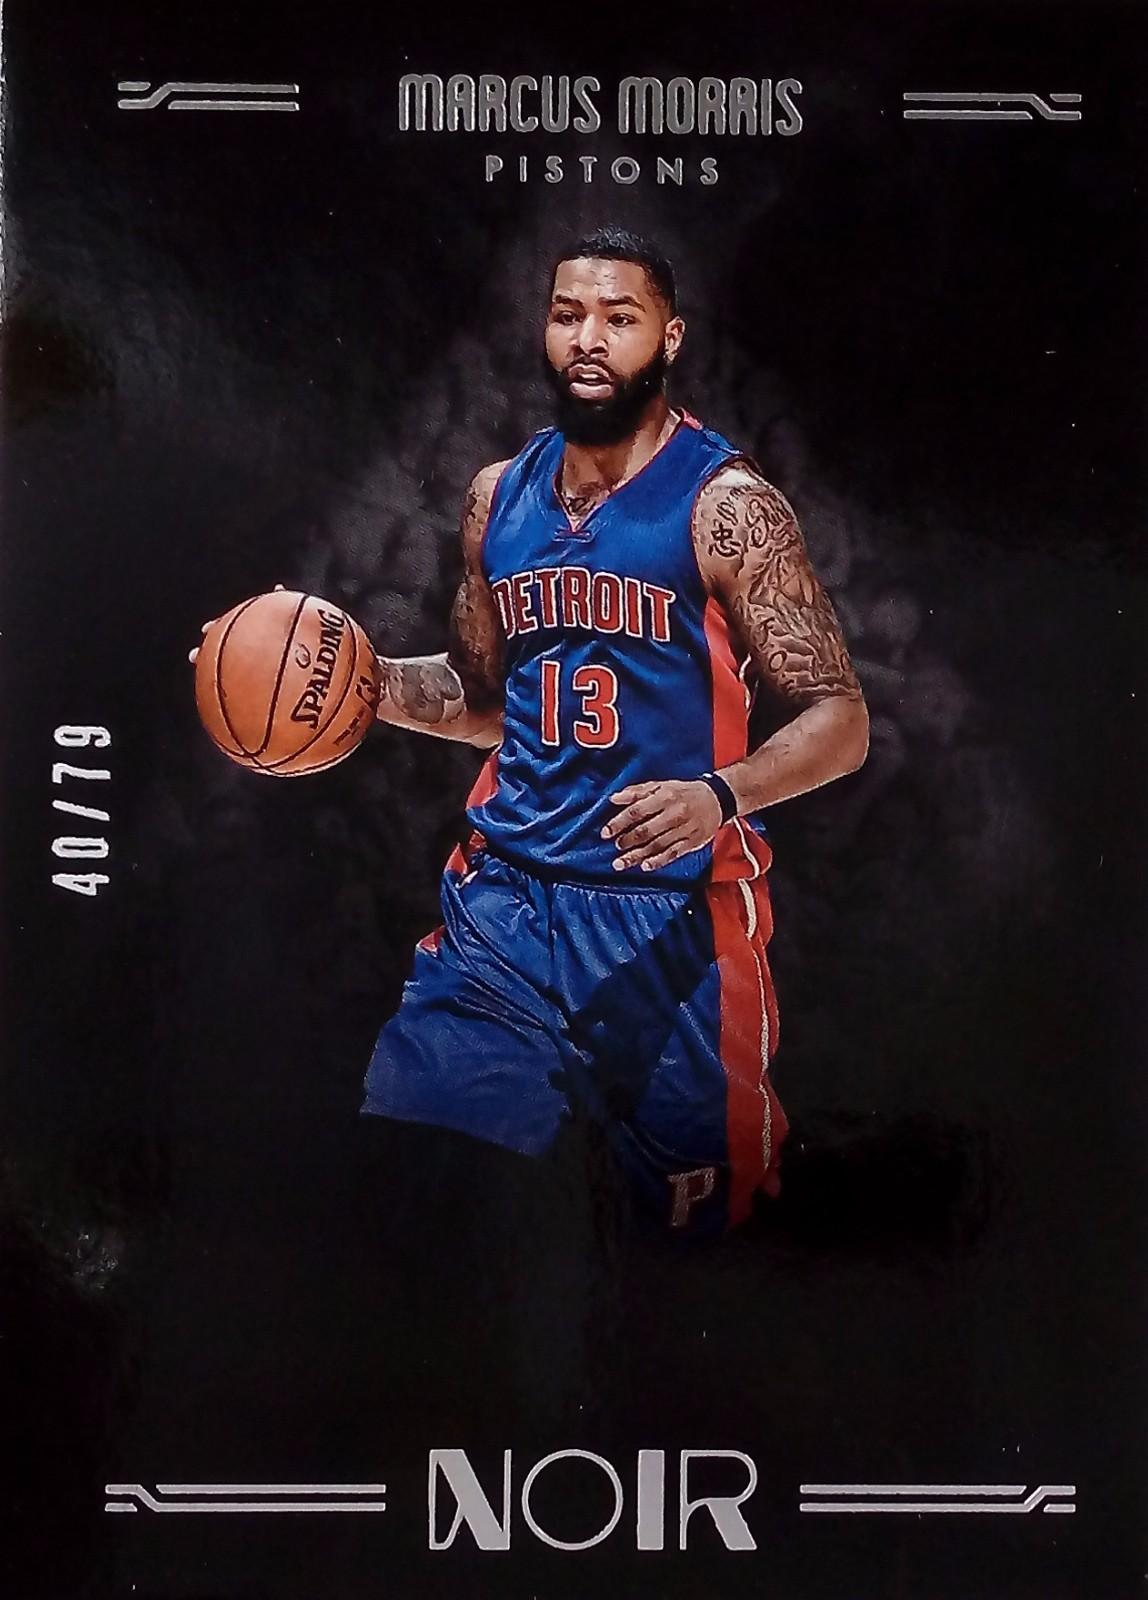 2016-17 Panini  诺尔篮球 基础卡彩色版 马库斯·莫里斯 底特律活塞  40-79